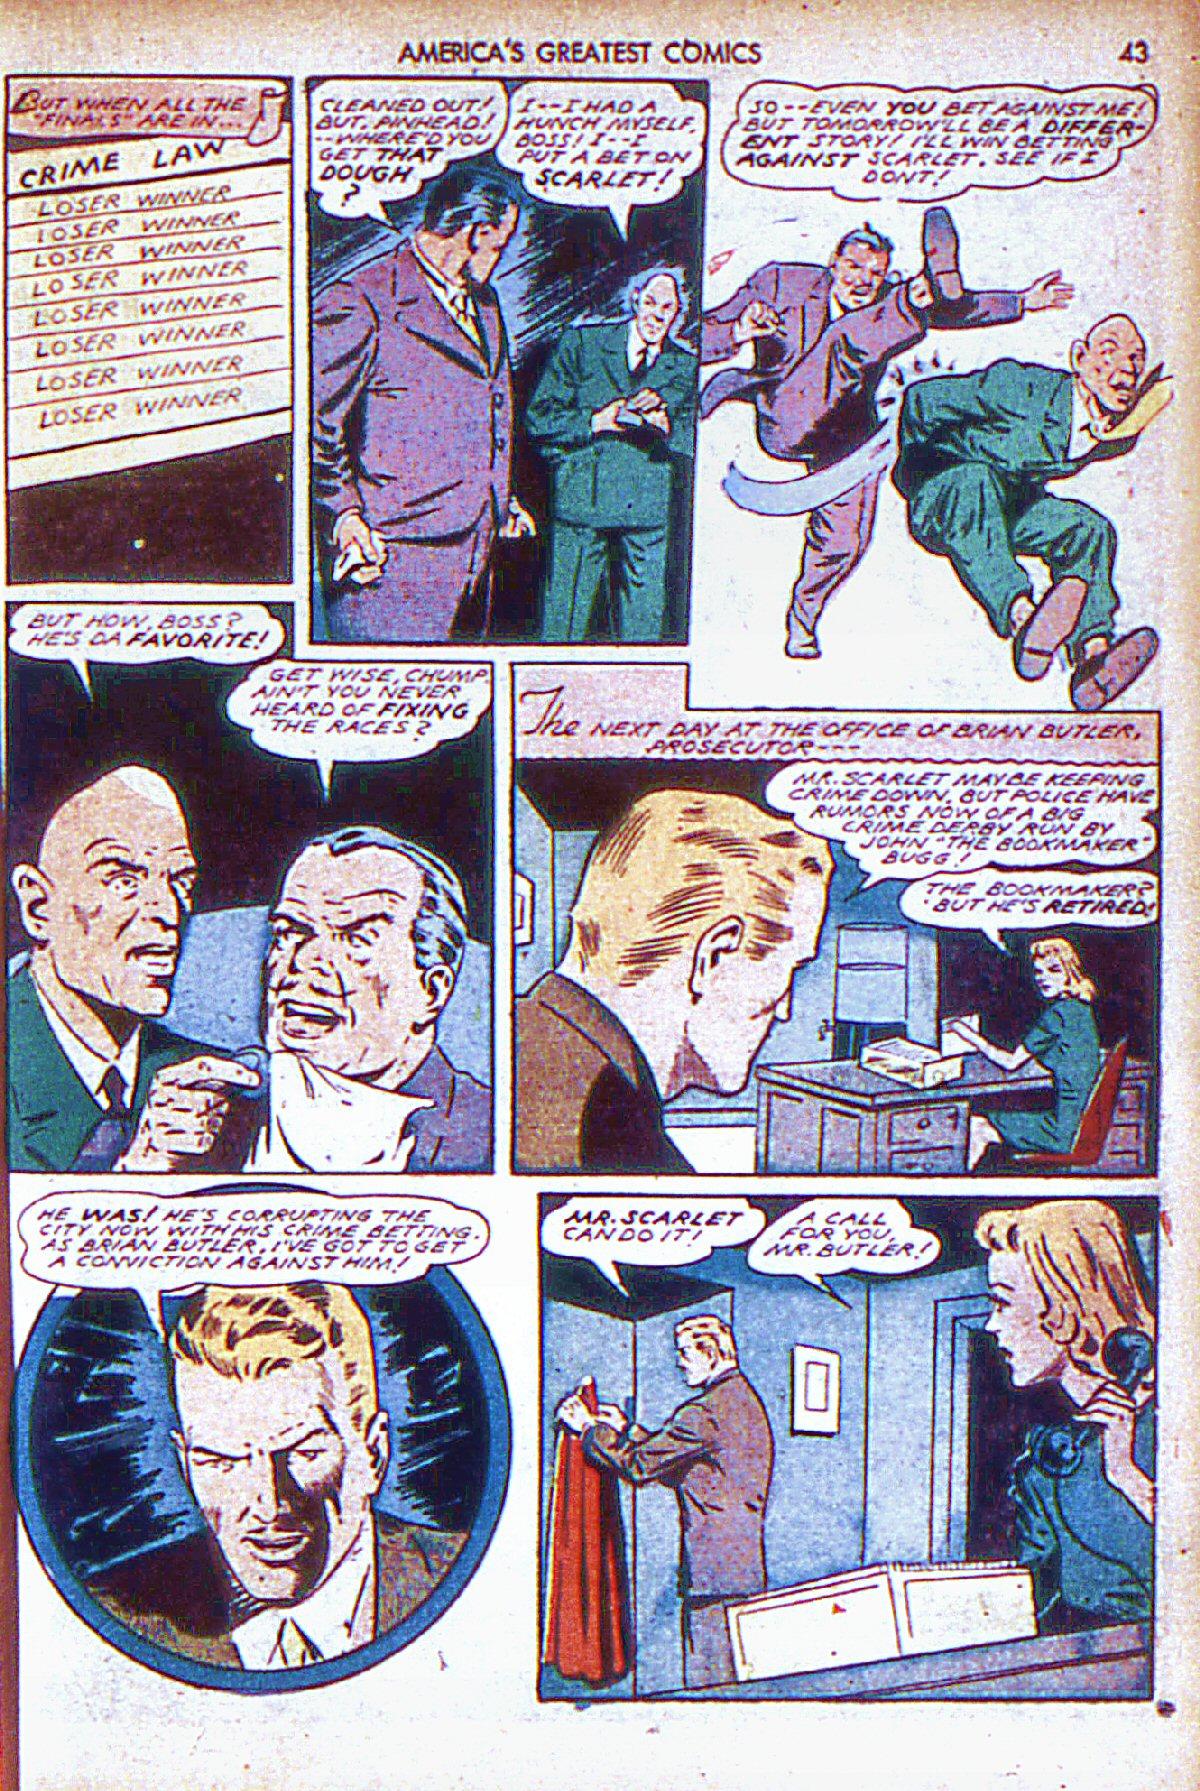 Read online America's Greatest Comics comic -  Issue #6 - 44